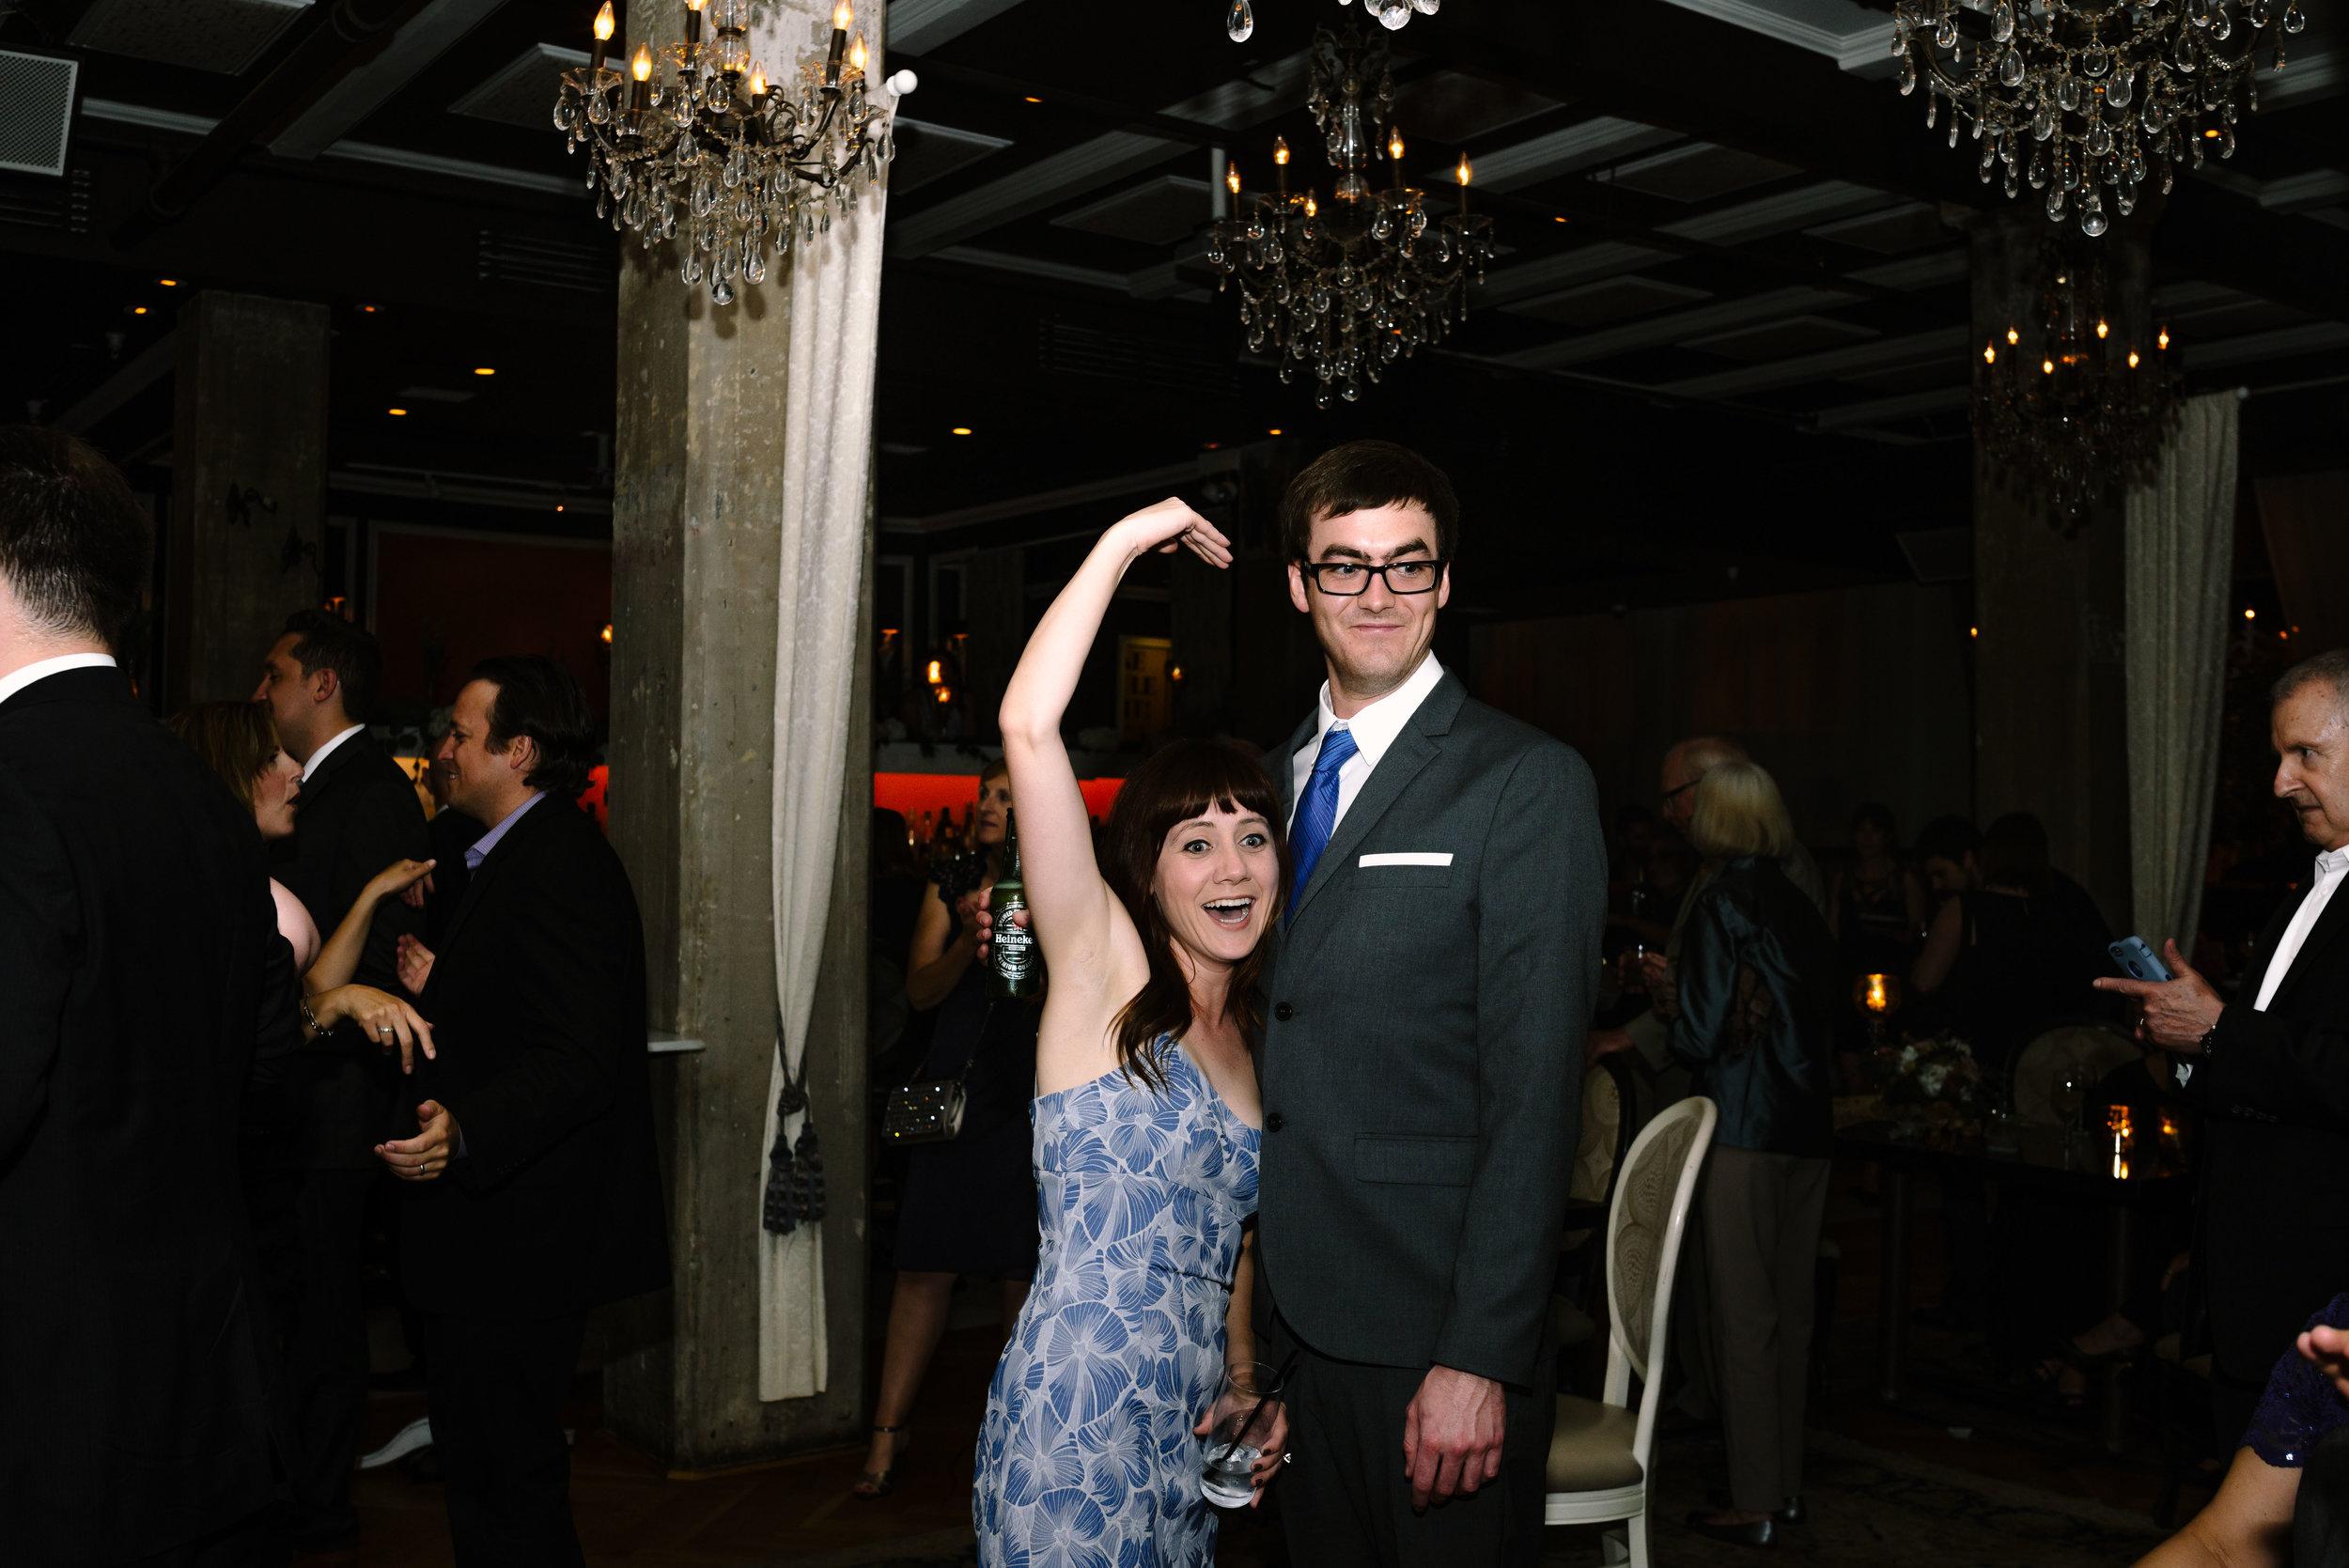 Patricia-Steve-Blog-Indianapolis-Wedding-142.jpg